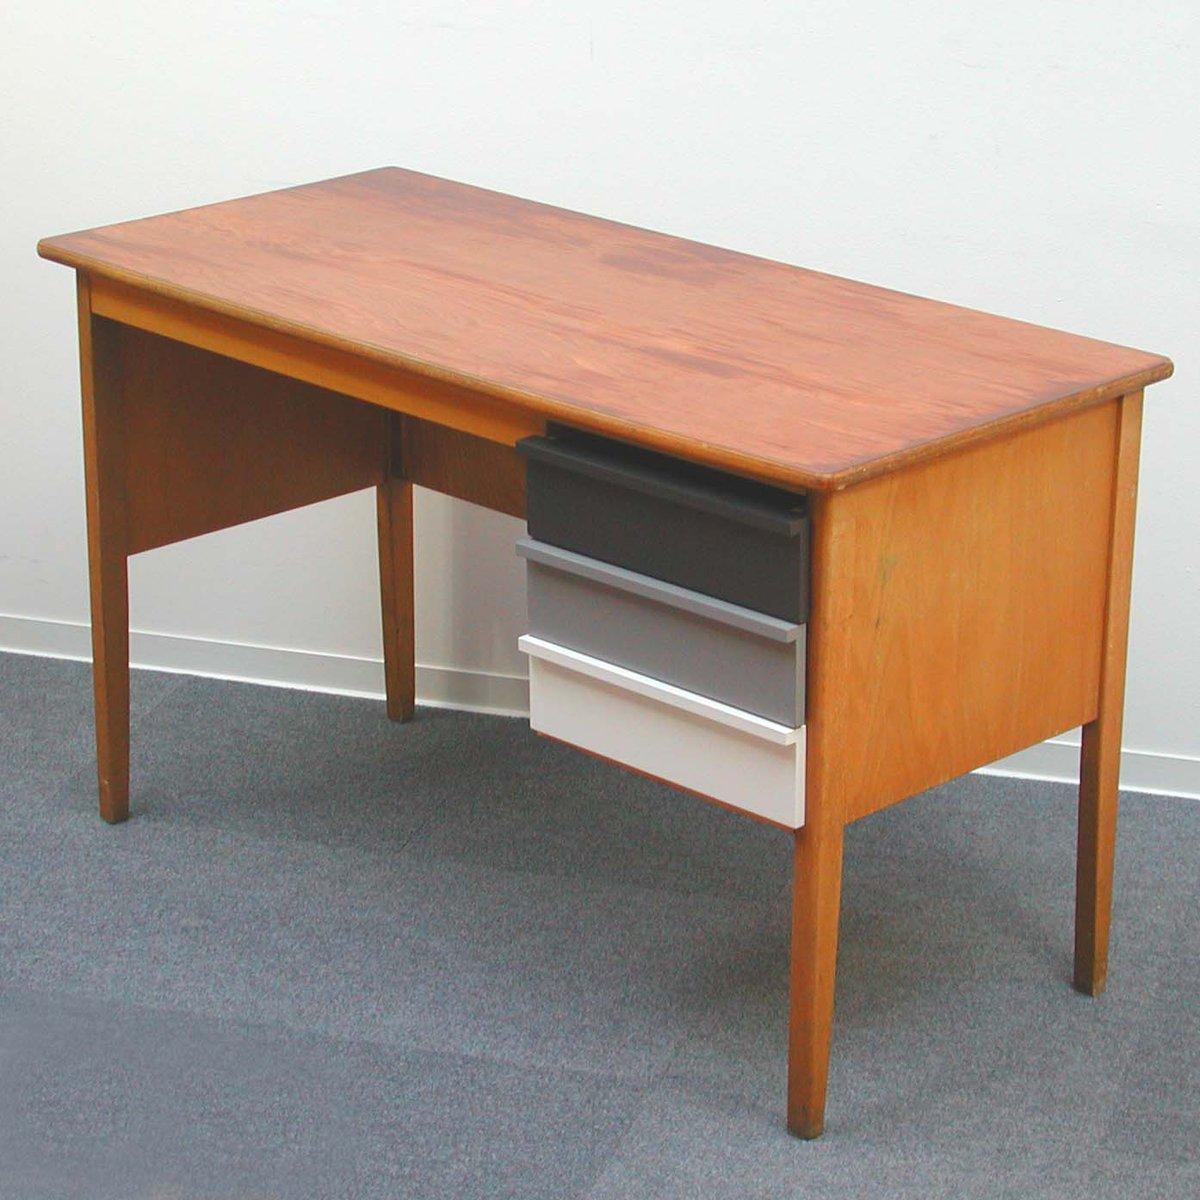 vintage wooden teacher s desk 1960s for sale at pamono rh pamono eu vintage wood desk organizer vintage wood desk chair replacement parts